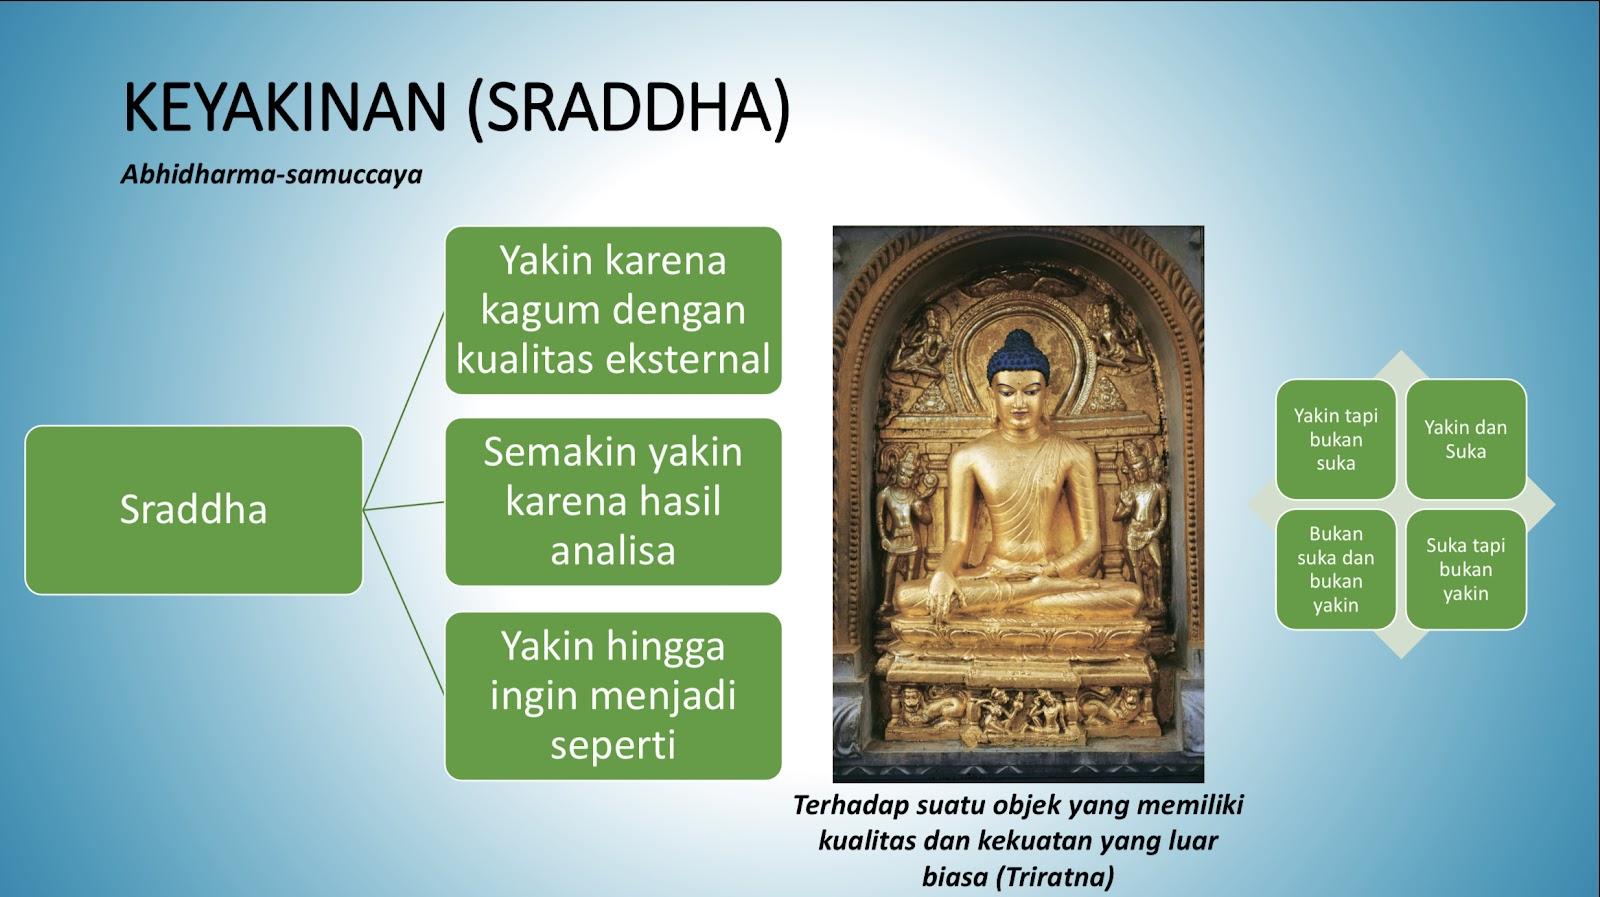 Johnson Khuo memaparkan keyakinan sebagai dasar untuk ziarah ke Borobudur